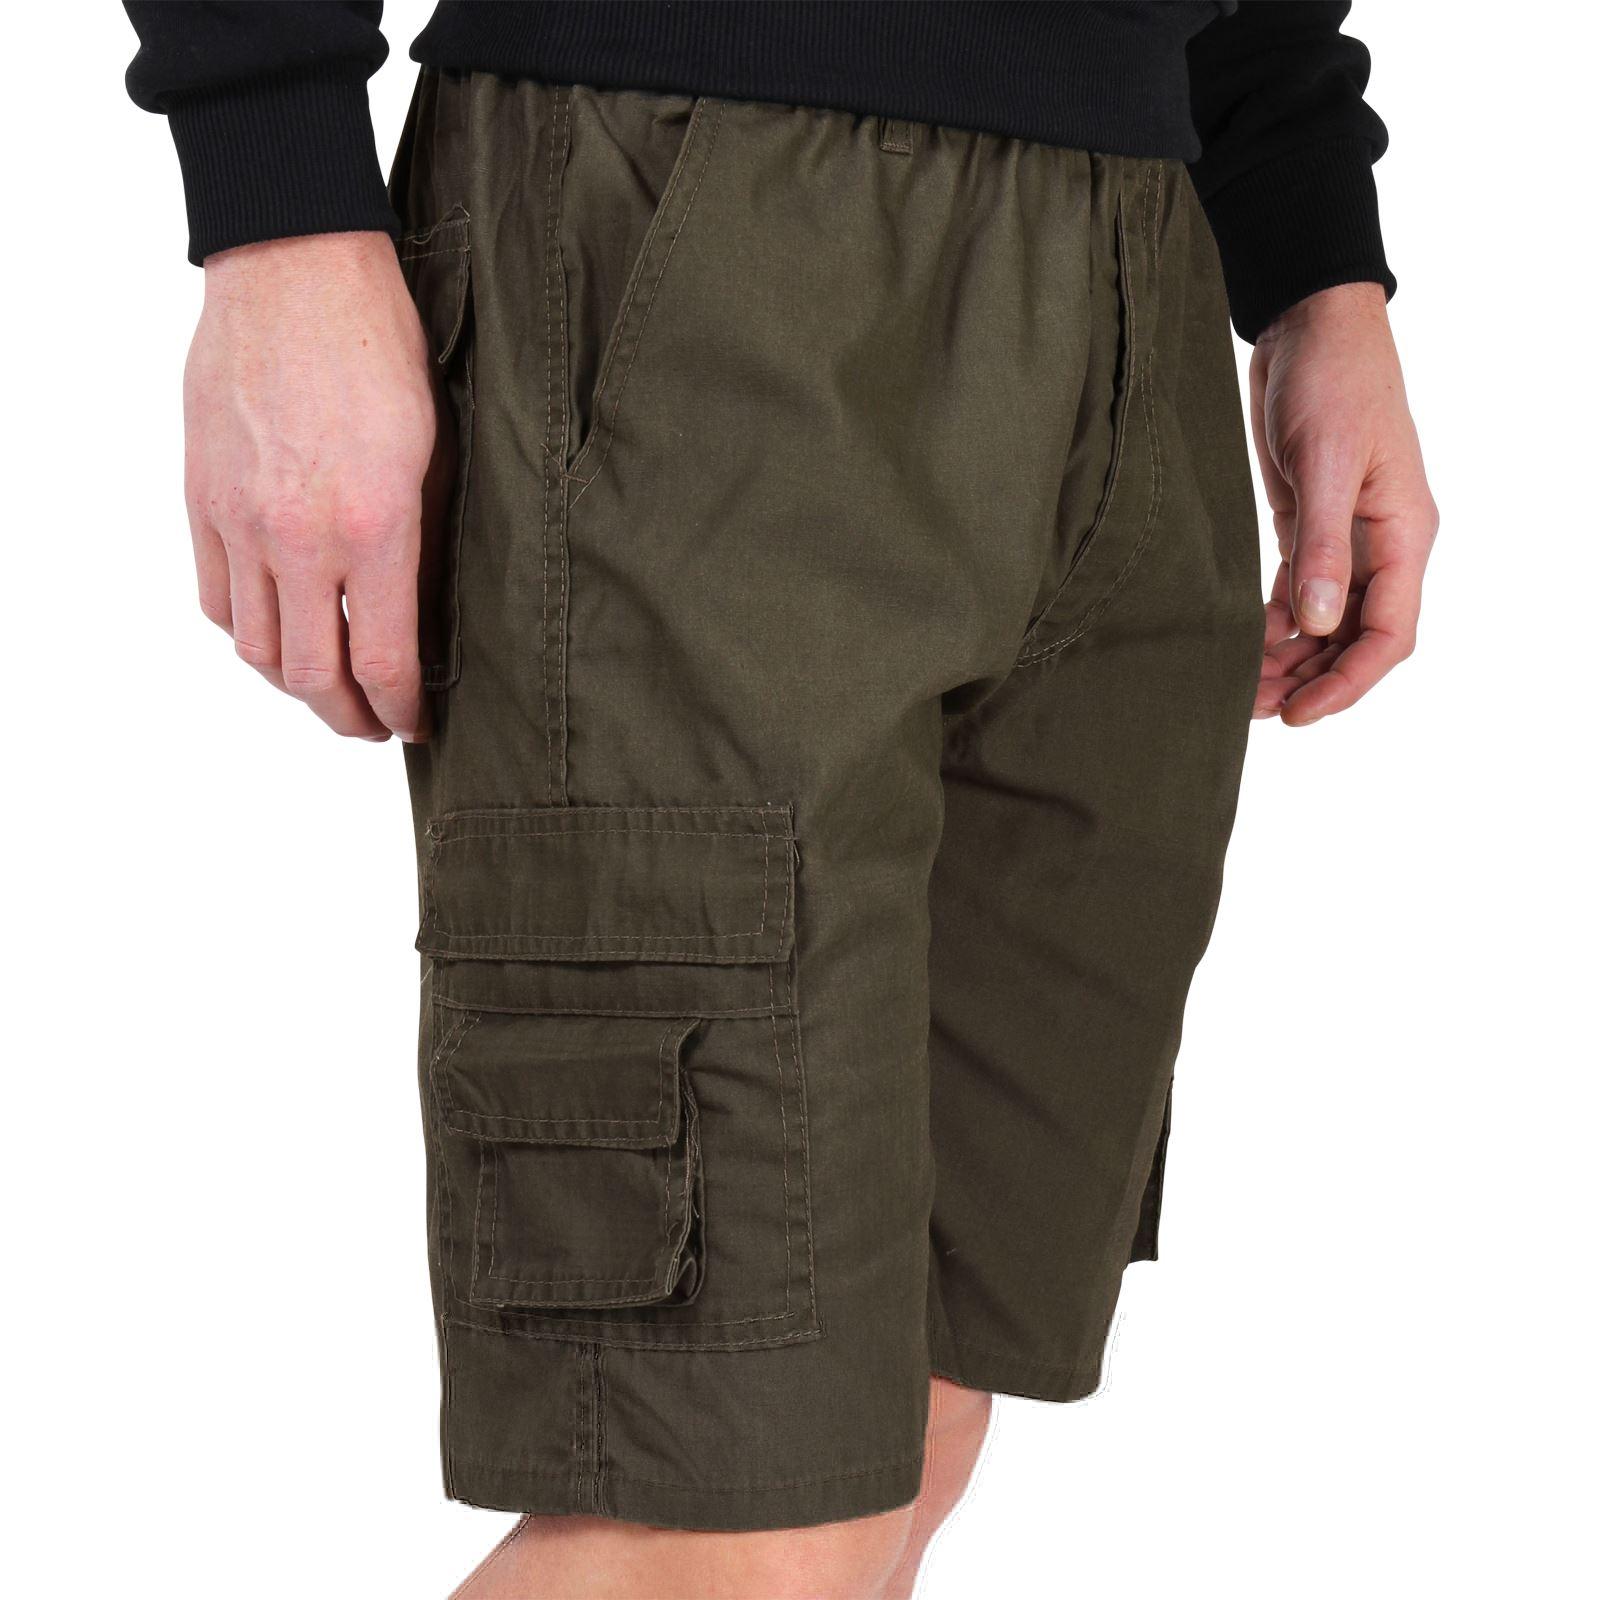 homme pantalon court cargo multi poches style militaire safari classiques ebay. Black Bedroom Furniture Sets. Home Design Ideas